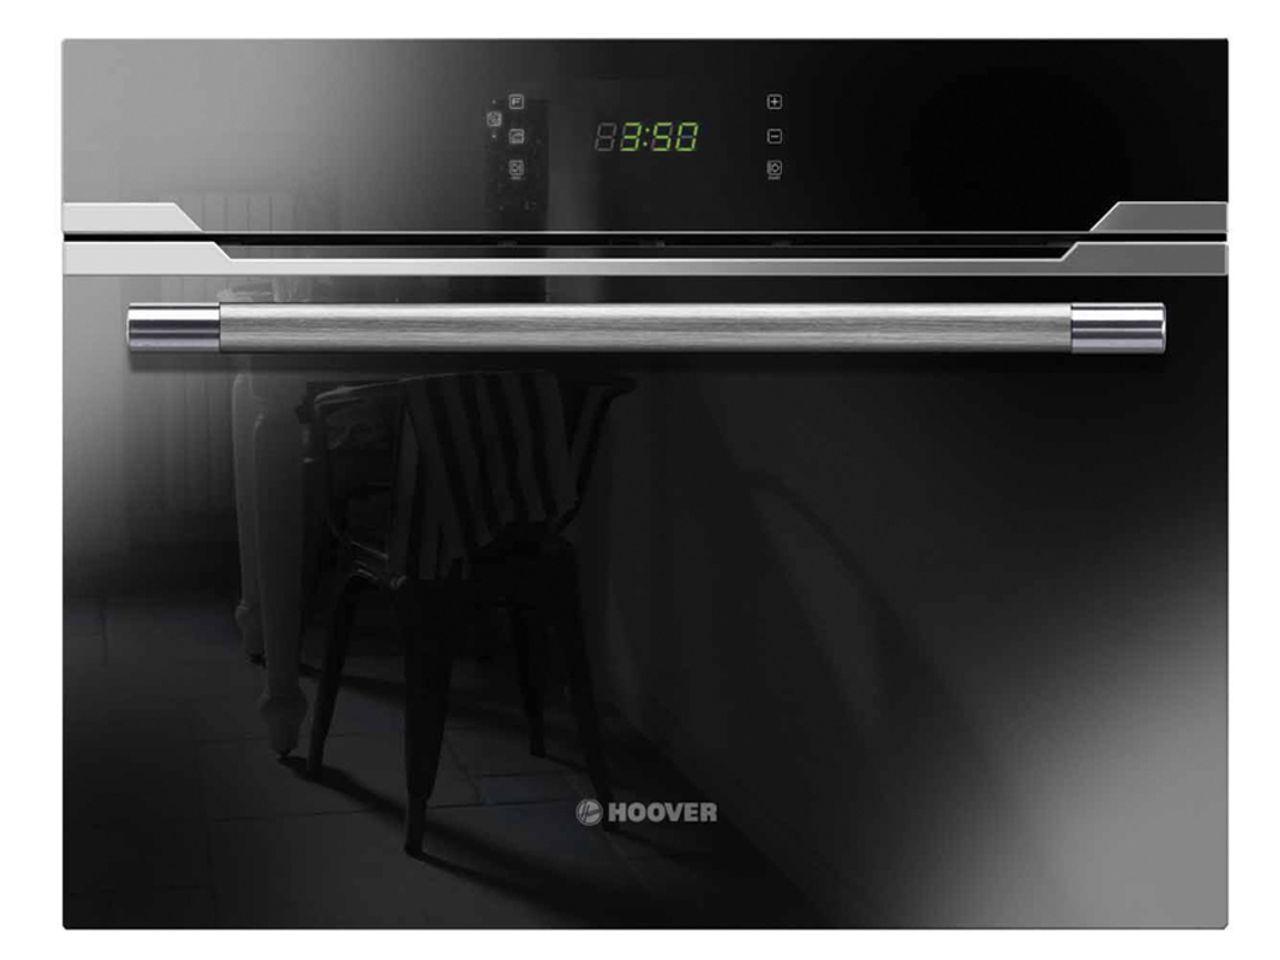 HOOVER HMC 440 TVX + 5 let záruka po registraci!